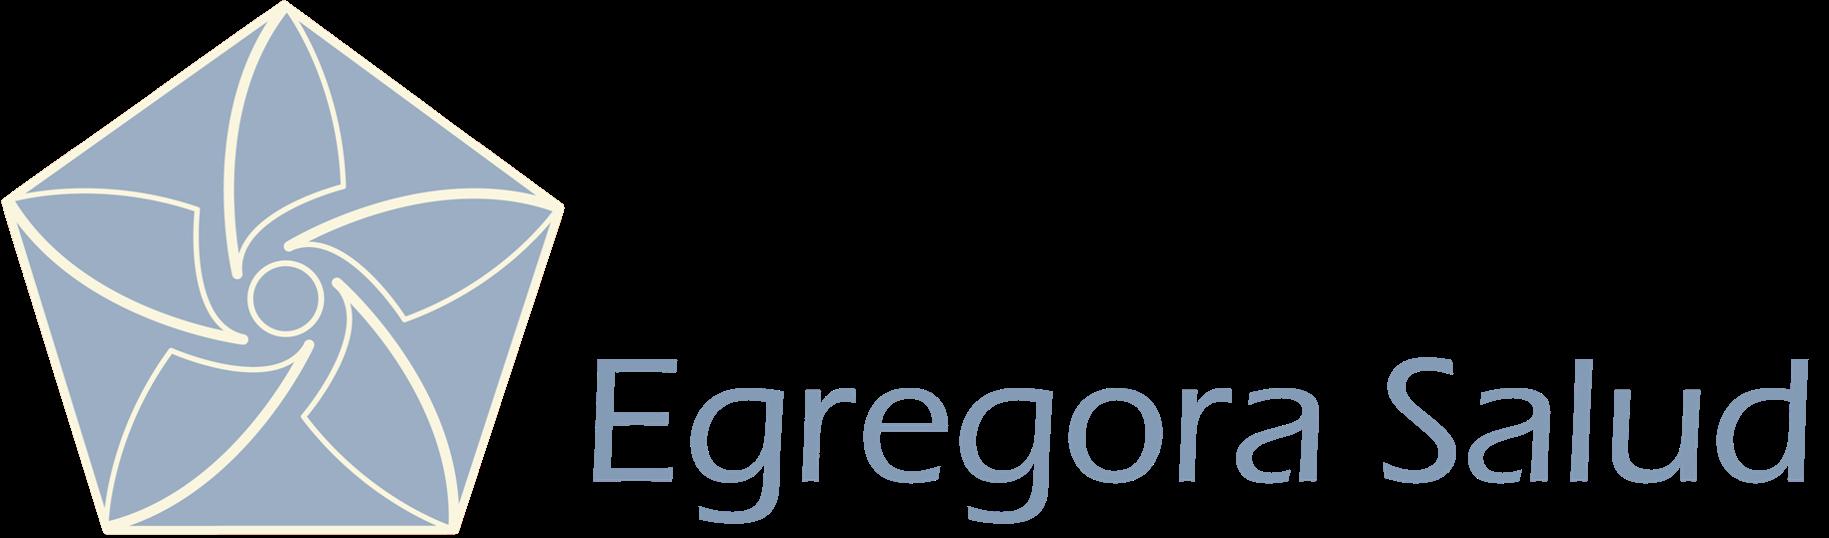 Egregora Salud